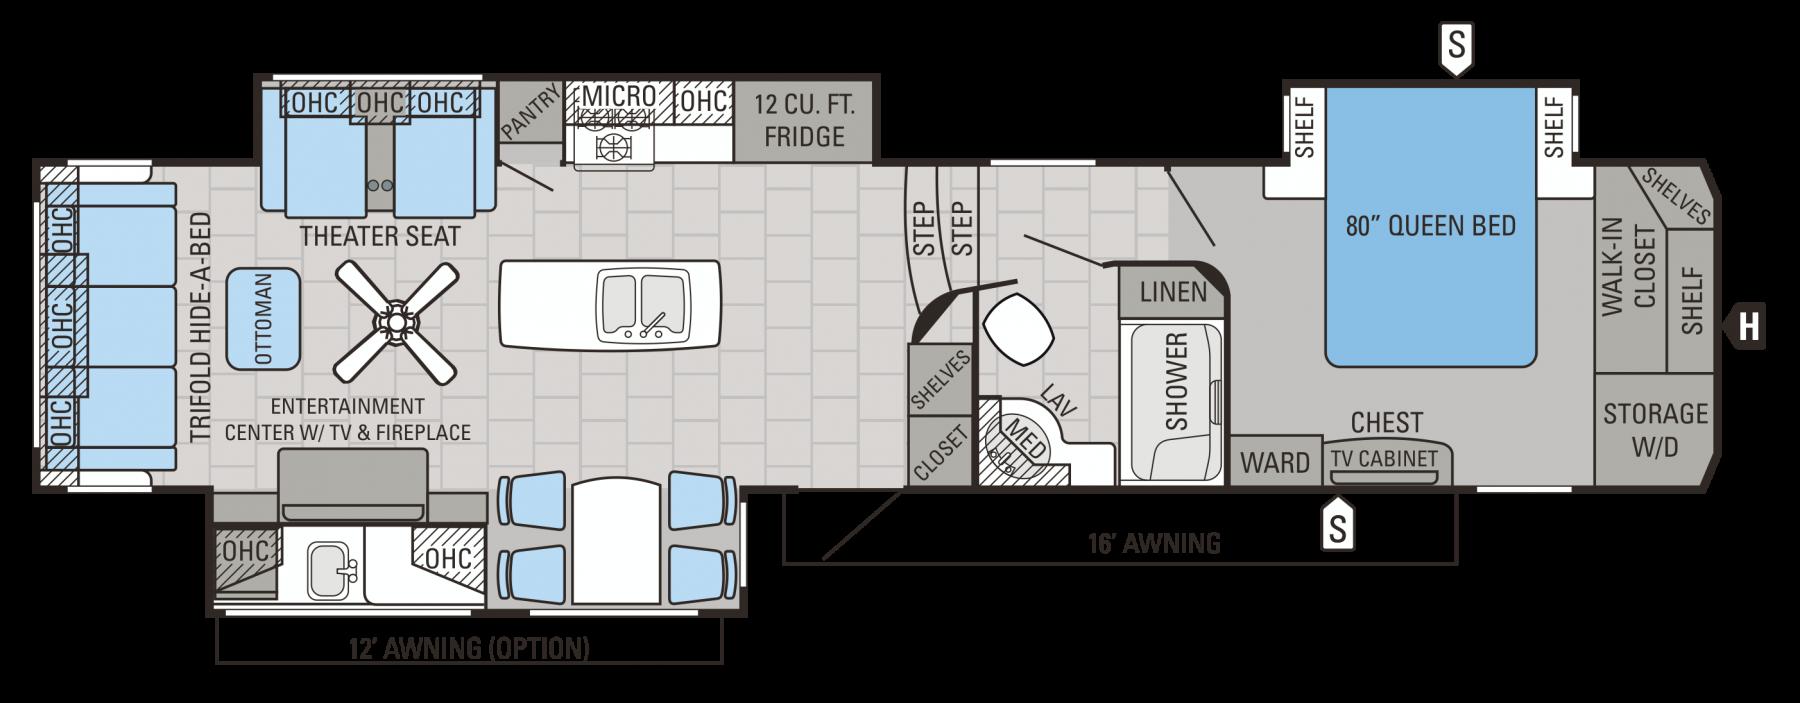 351RSTS Floorplan